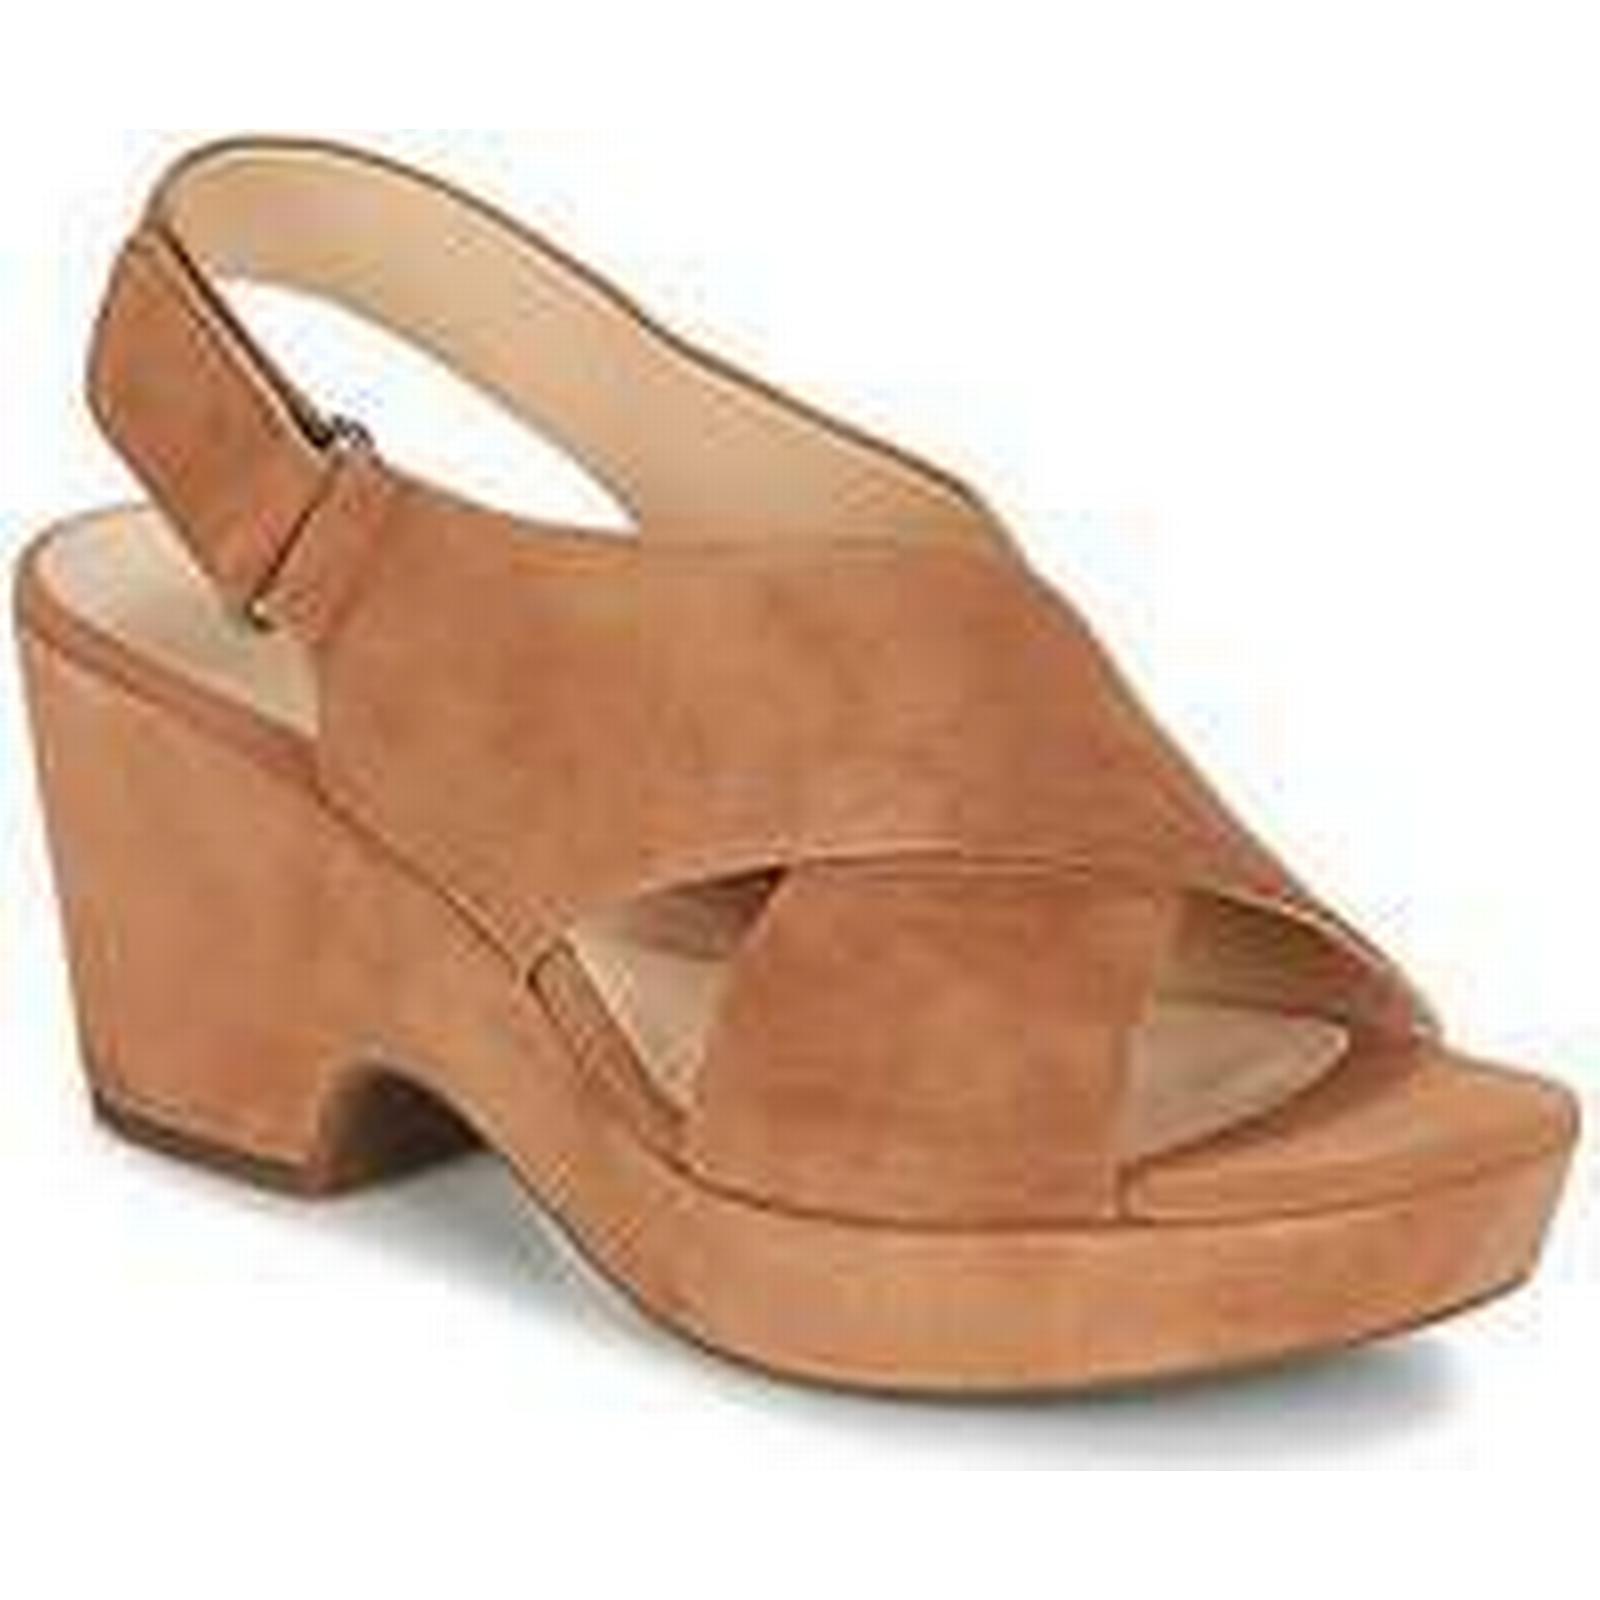 Spartoo.co.uk Clarks MARITSA Sandals LARA women's Sandals MARITSA in Beige dbca89